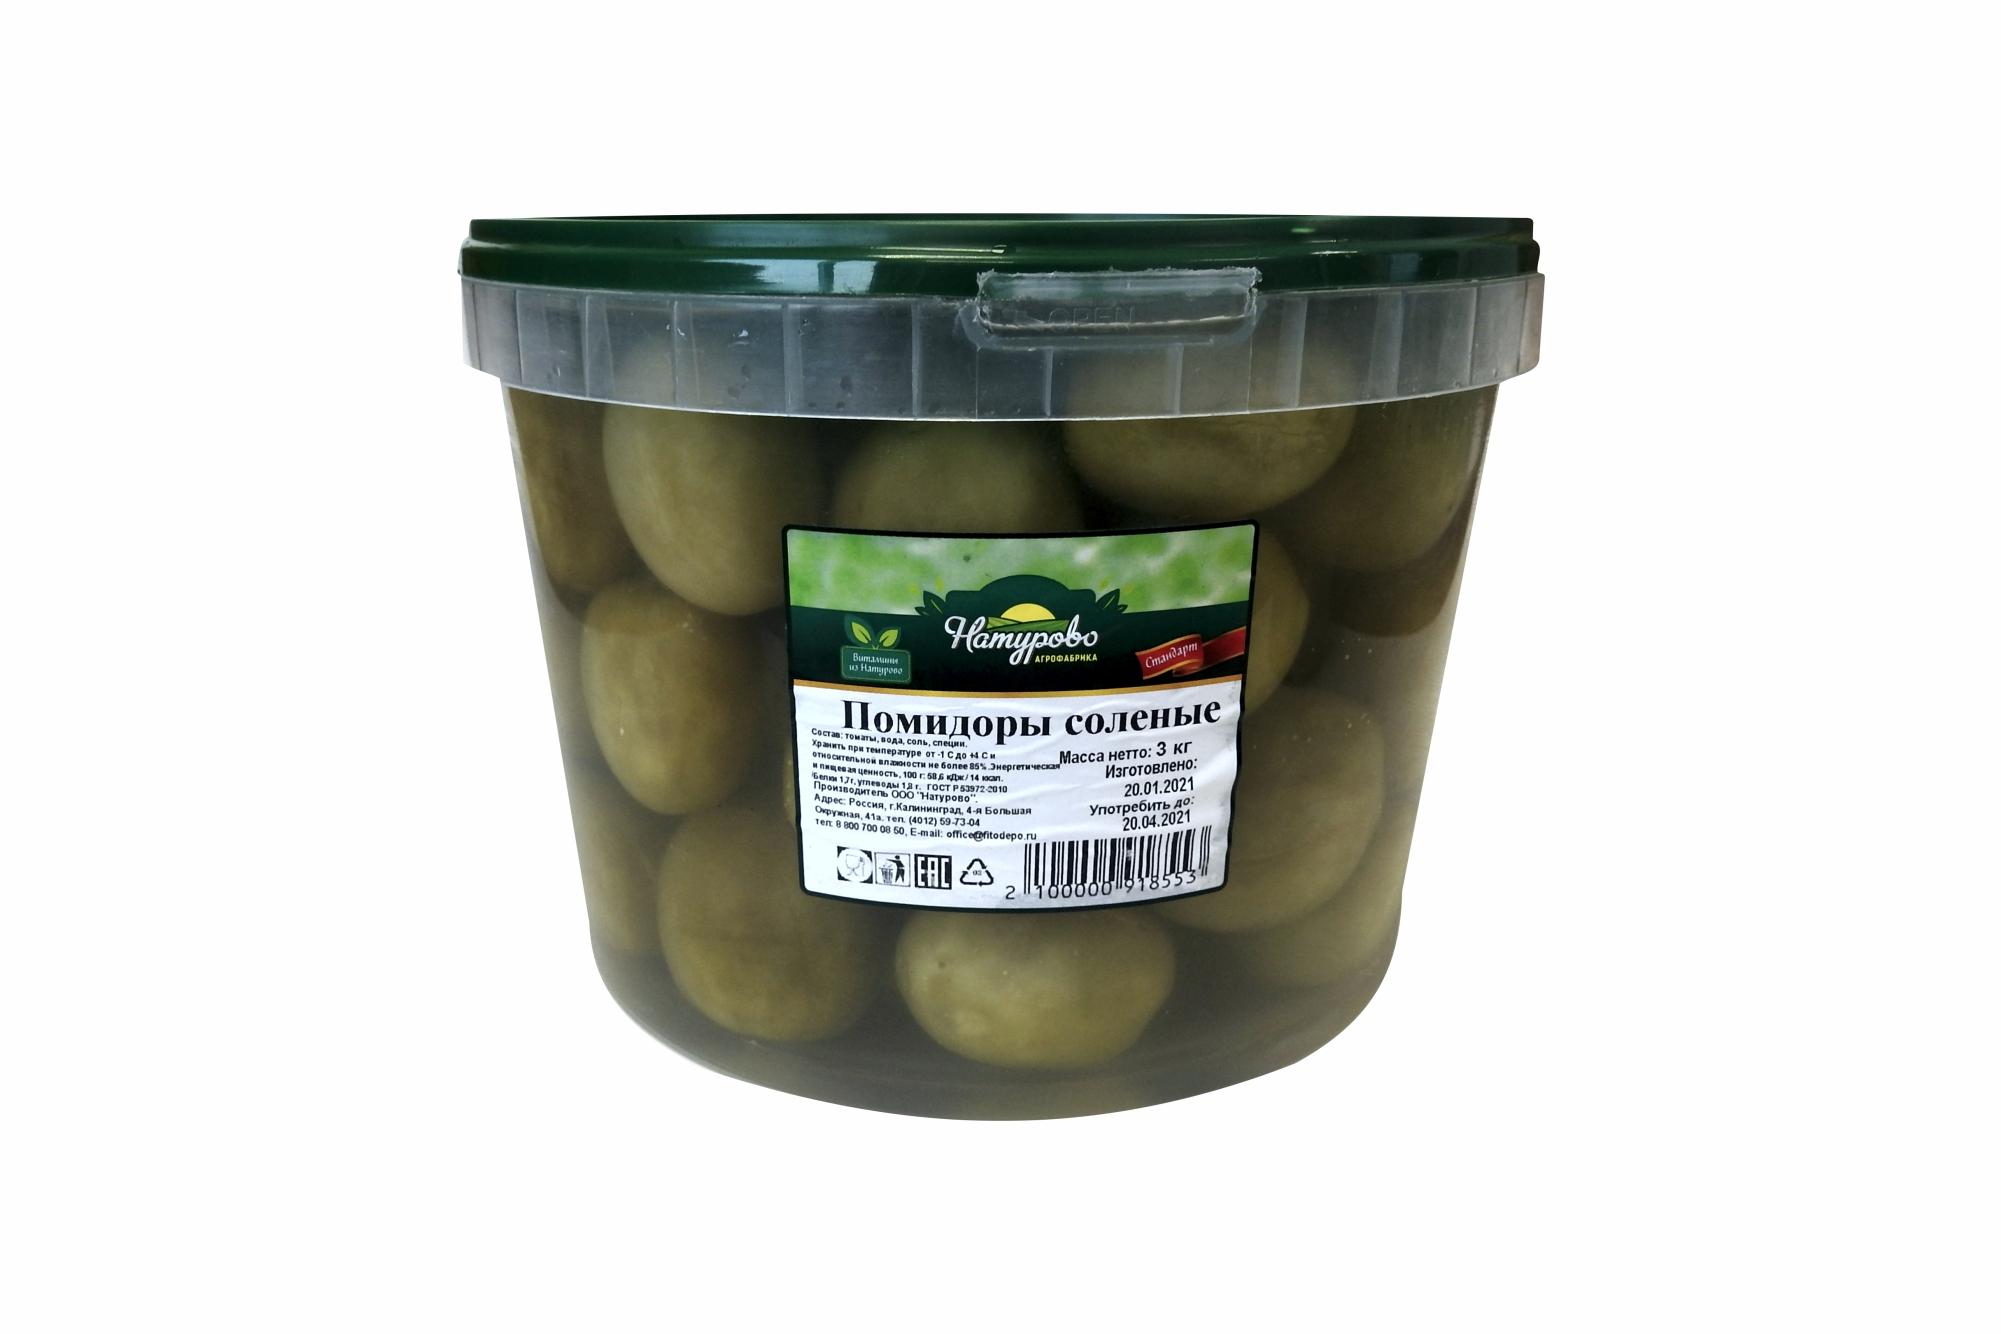 https://naturovo.ru/wp-content/uploads/2016/01/pomidory-solenye-3kg.jpg